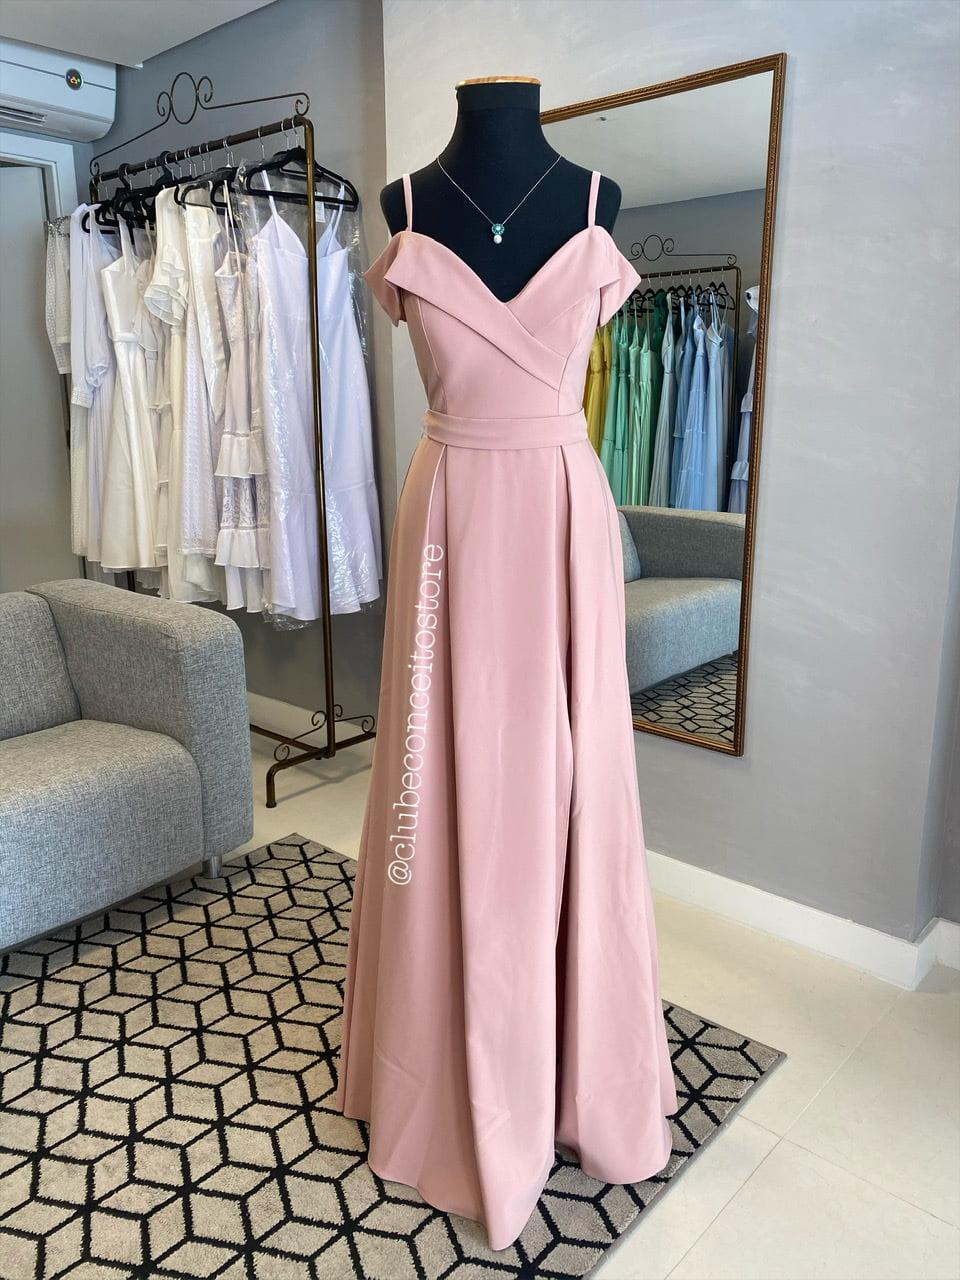 Vestido de Festa Longo Rosé Ombro a Ombro Madrinha, Convidada, Formanda.